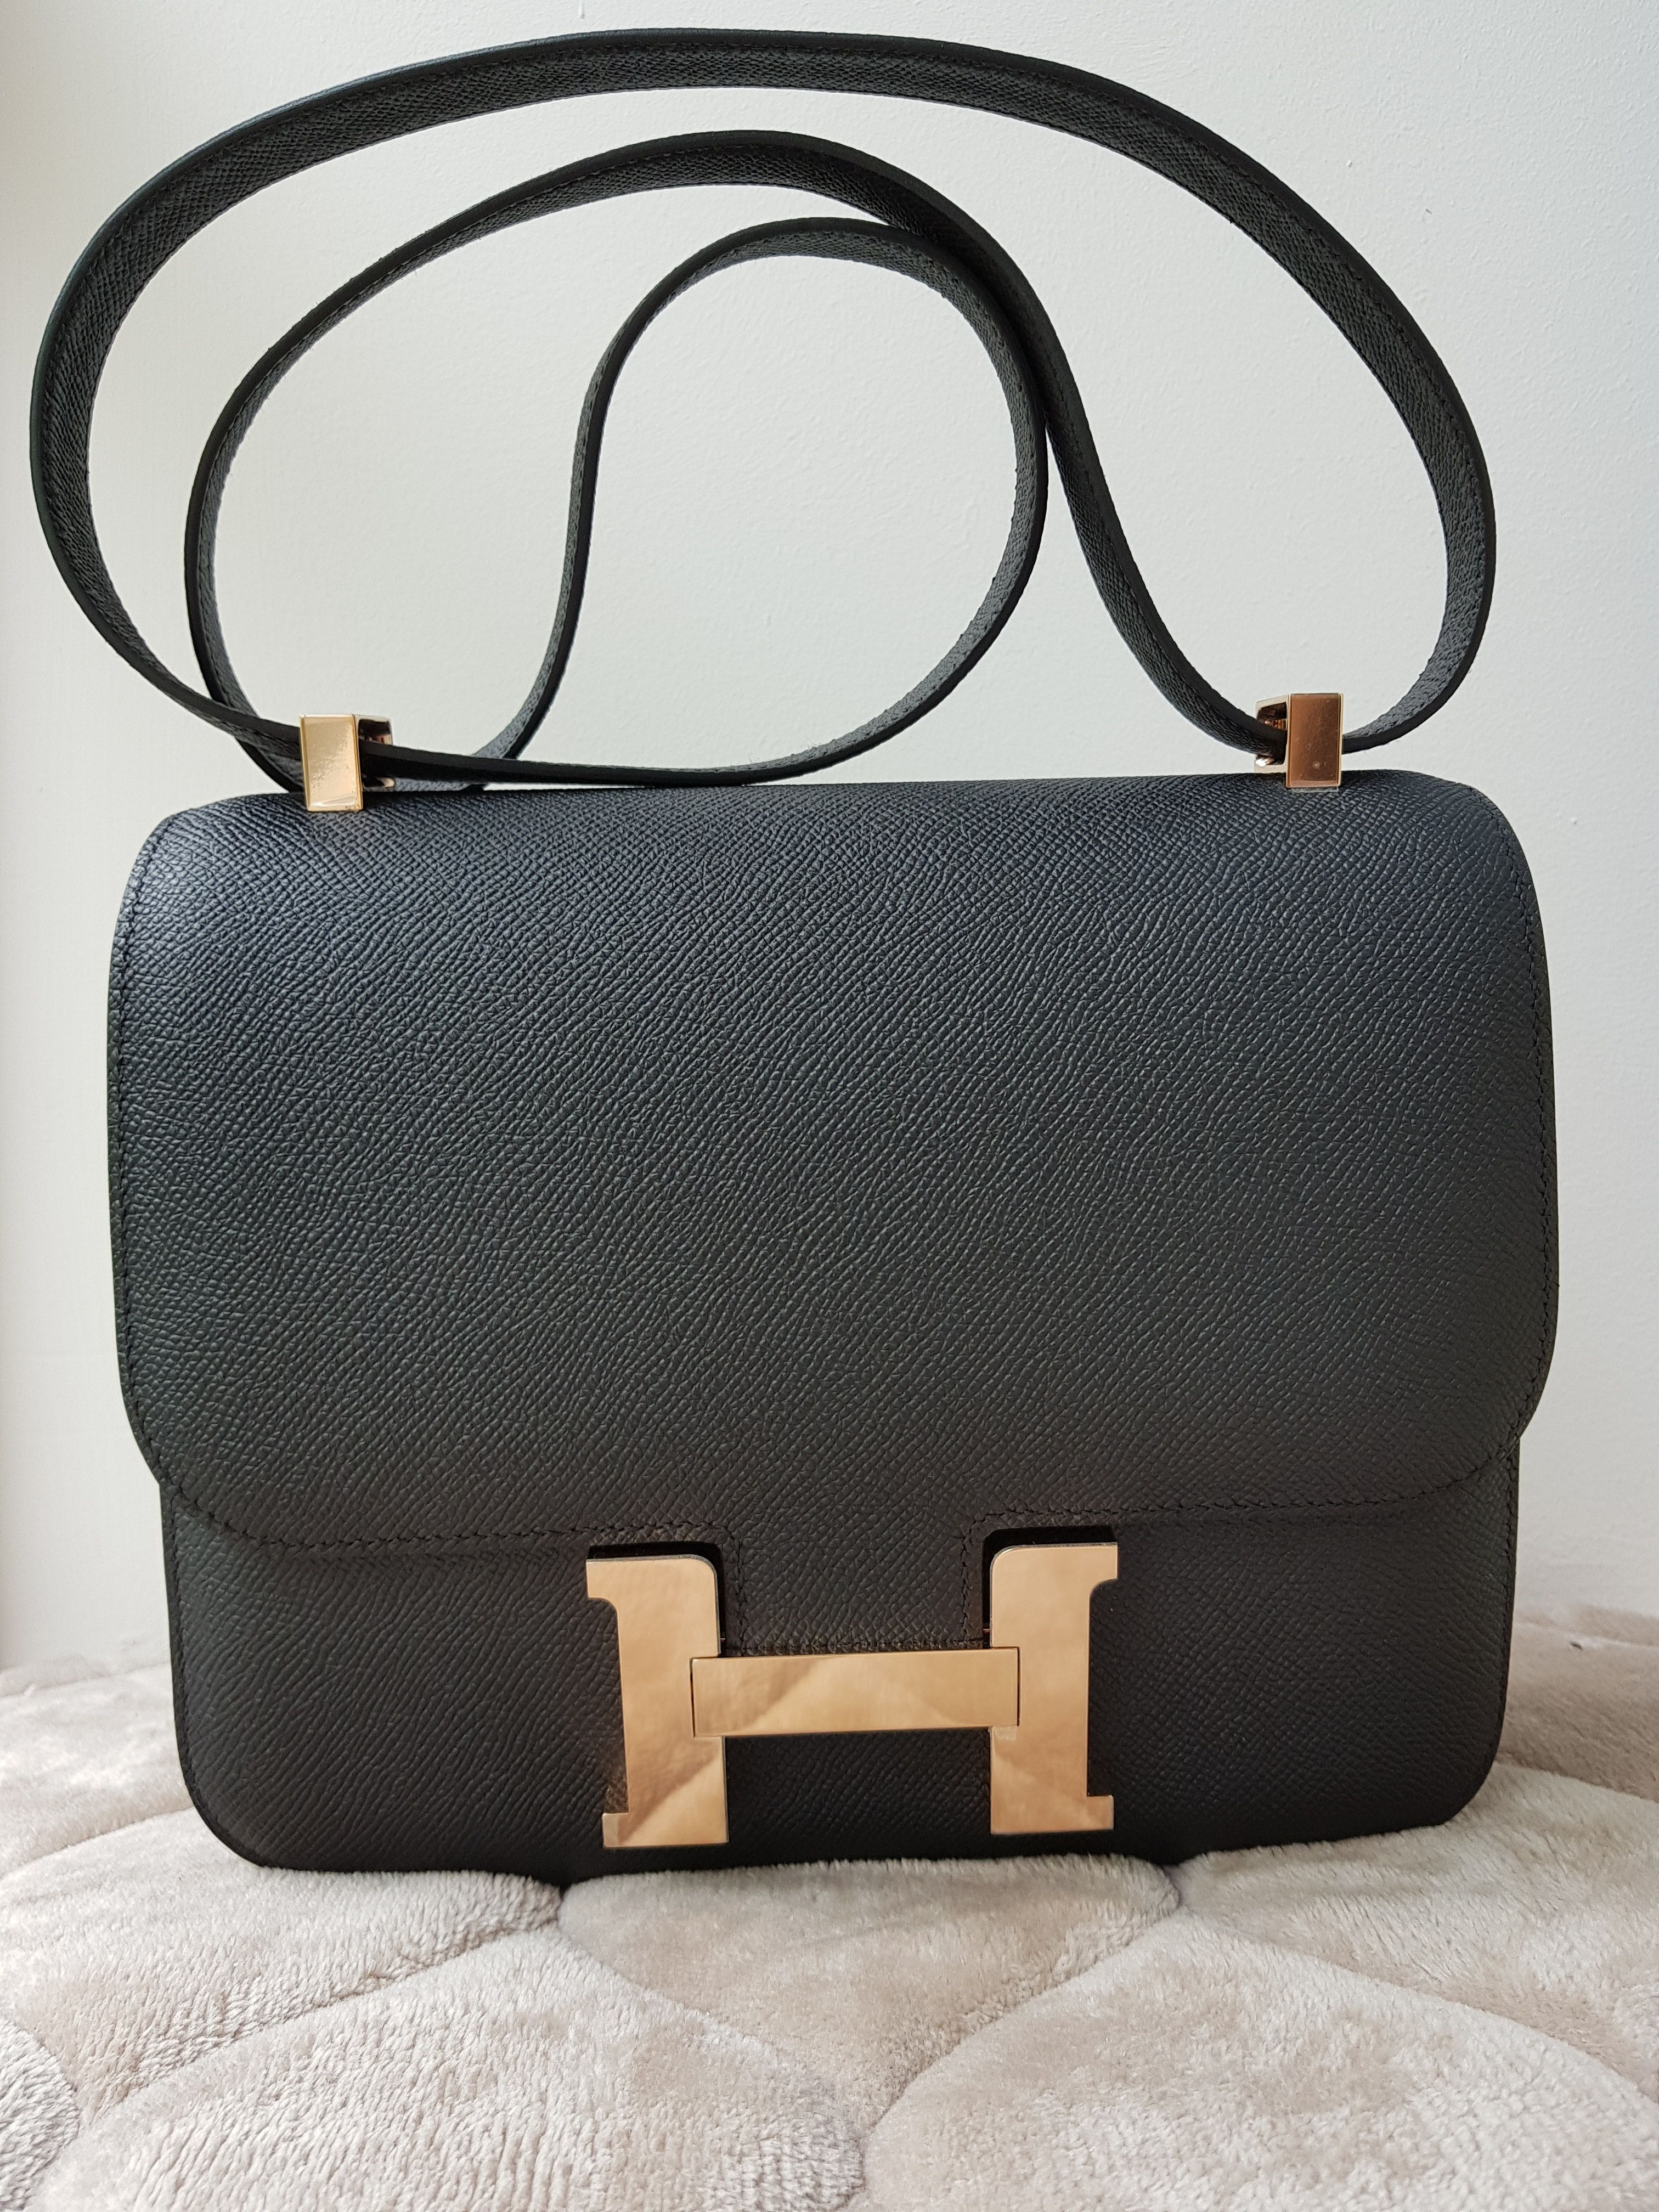 908471026526 Bnib Hermes C24 Black Epsom Rosegold Hardware A by Ciaciasg Mybeautifulbags  Brand new in box Hermes